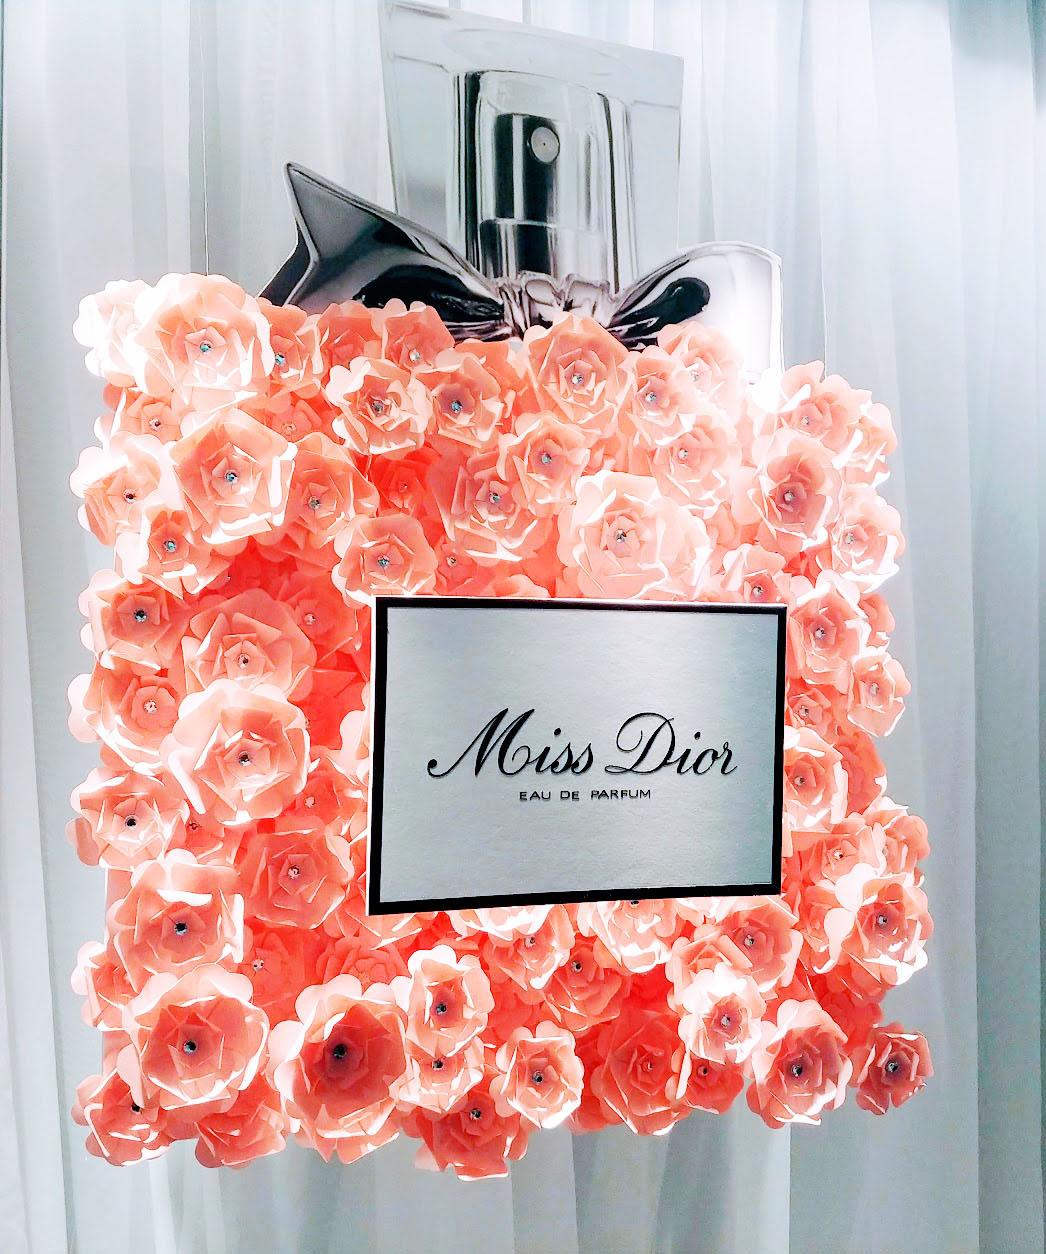 Miss Dior, Absolutely Blooming | Seneca College<br/><i>Judy Solakofski</i>